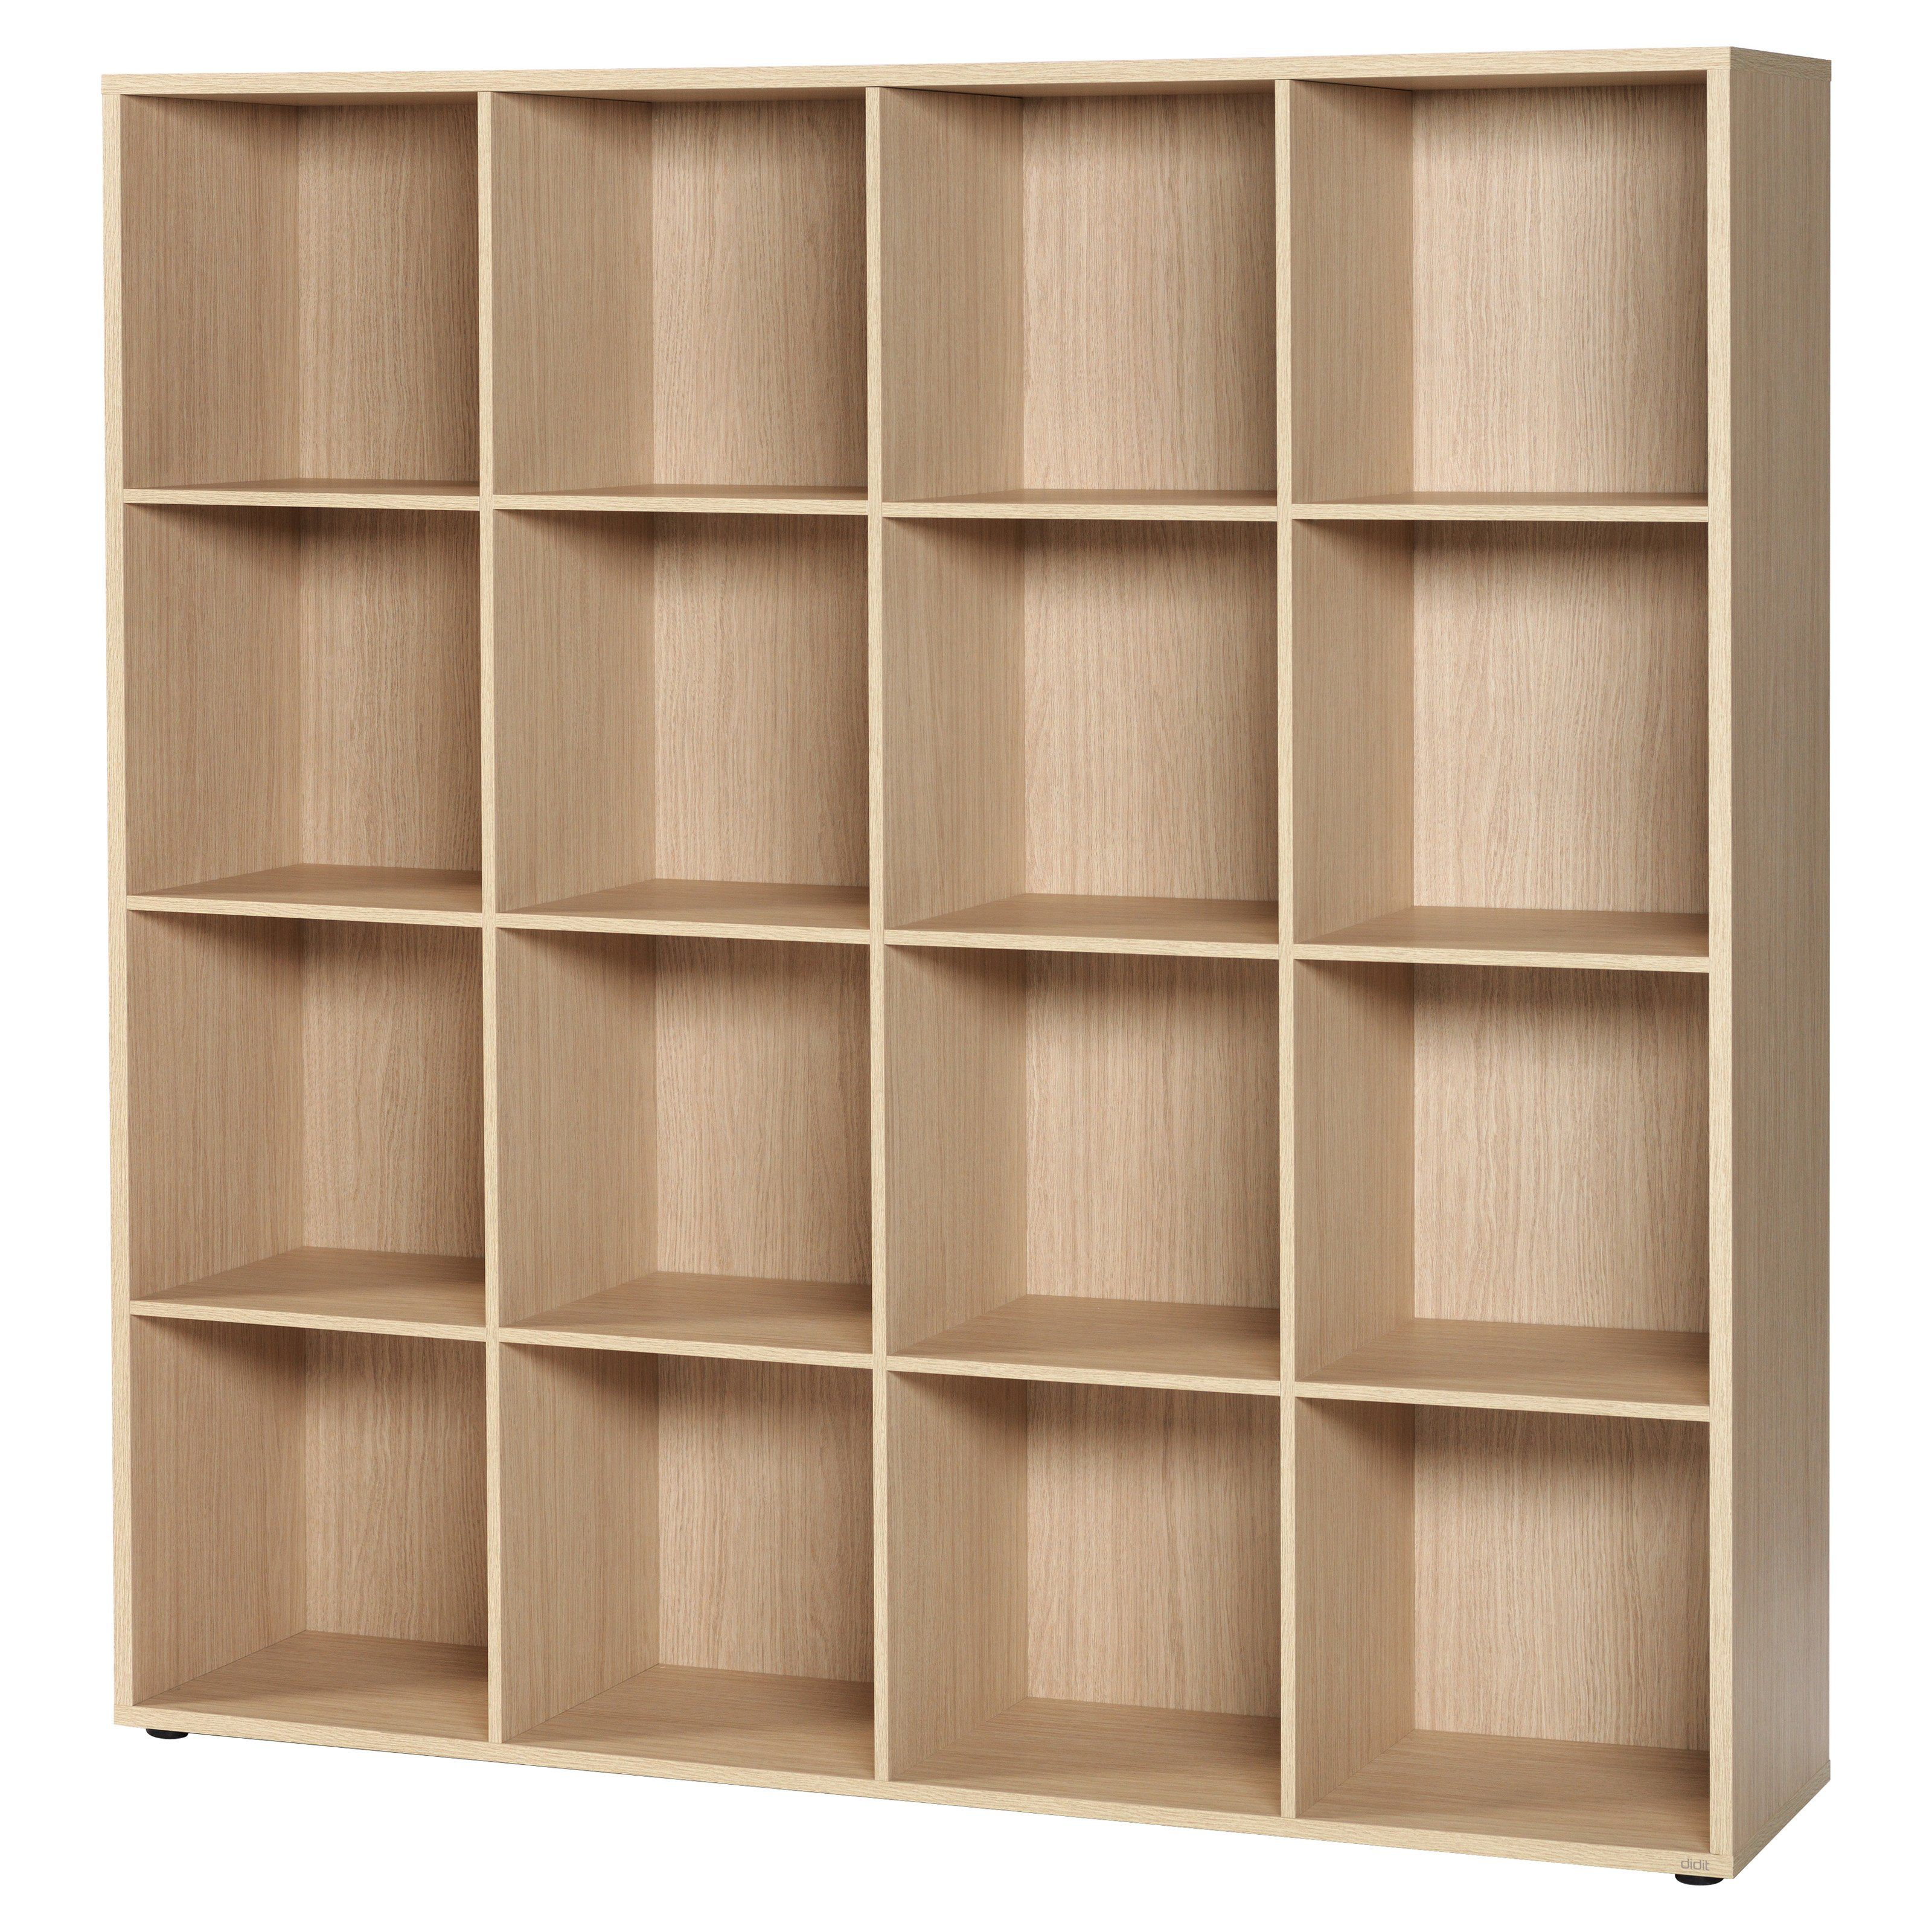 living bassett storage bookcase asp open storeroom library shelving cabinet triple bookcases modular furniture